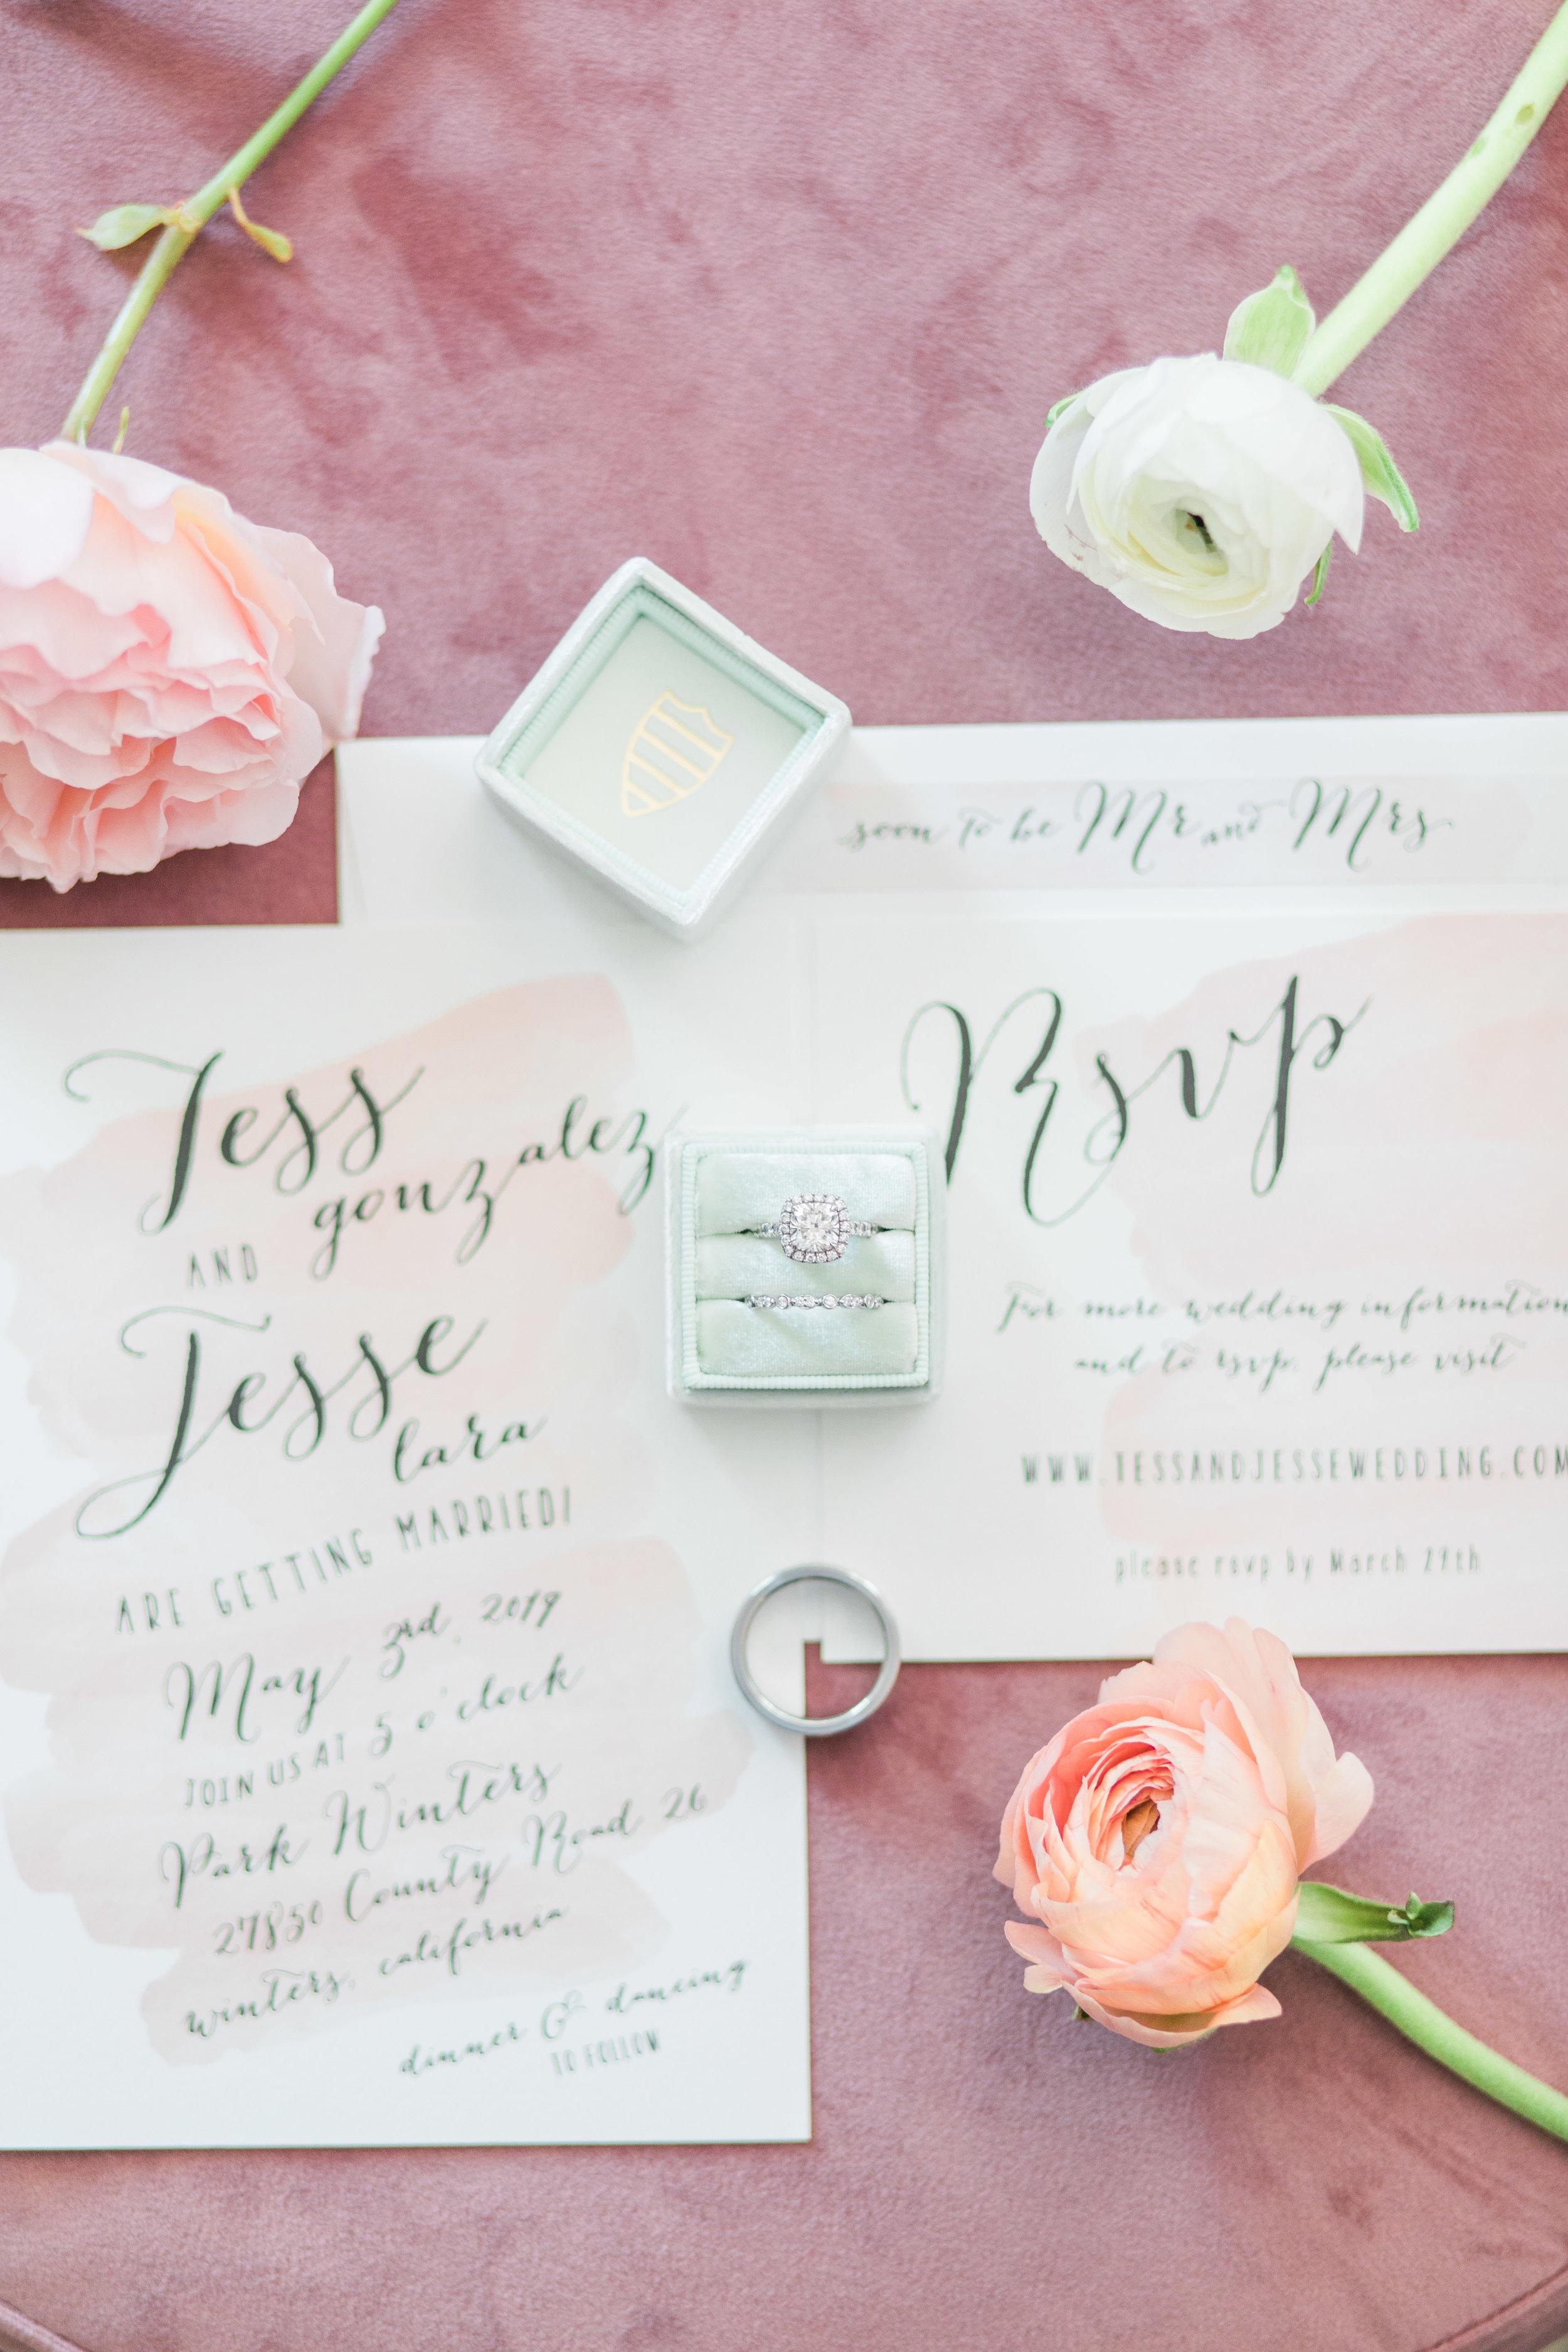 Tess-Jesse-Wedding-SP-by-JBJ-Pictures-2.jpg